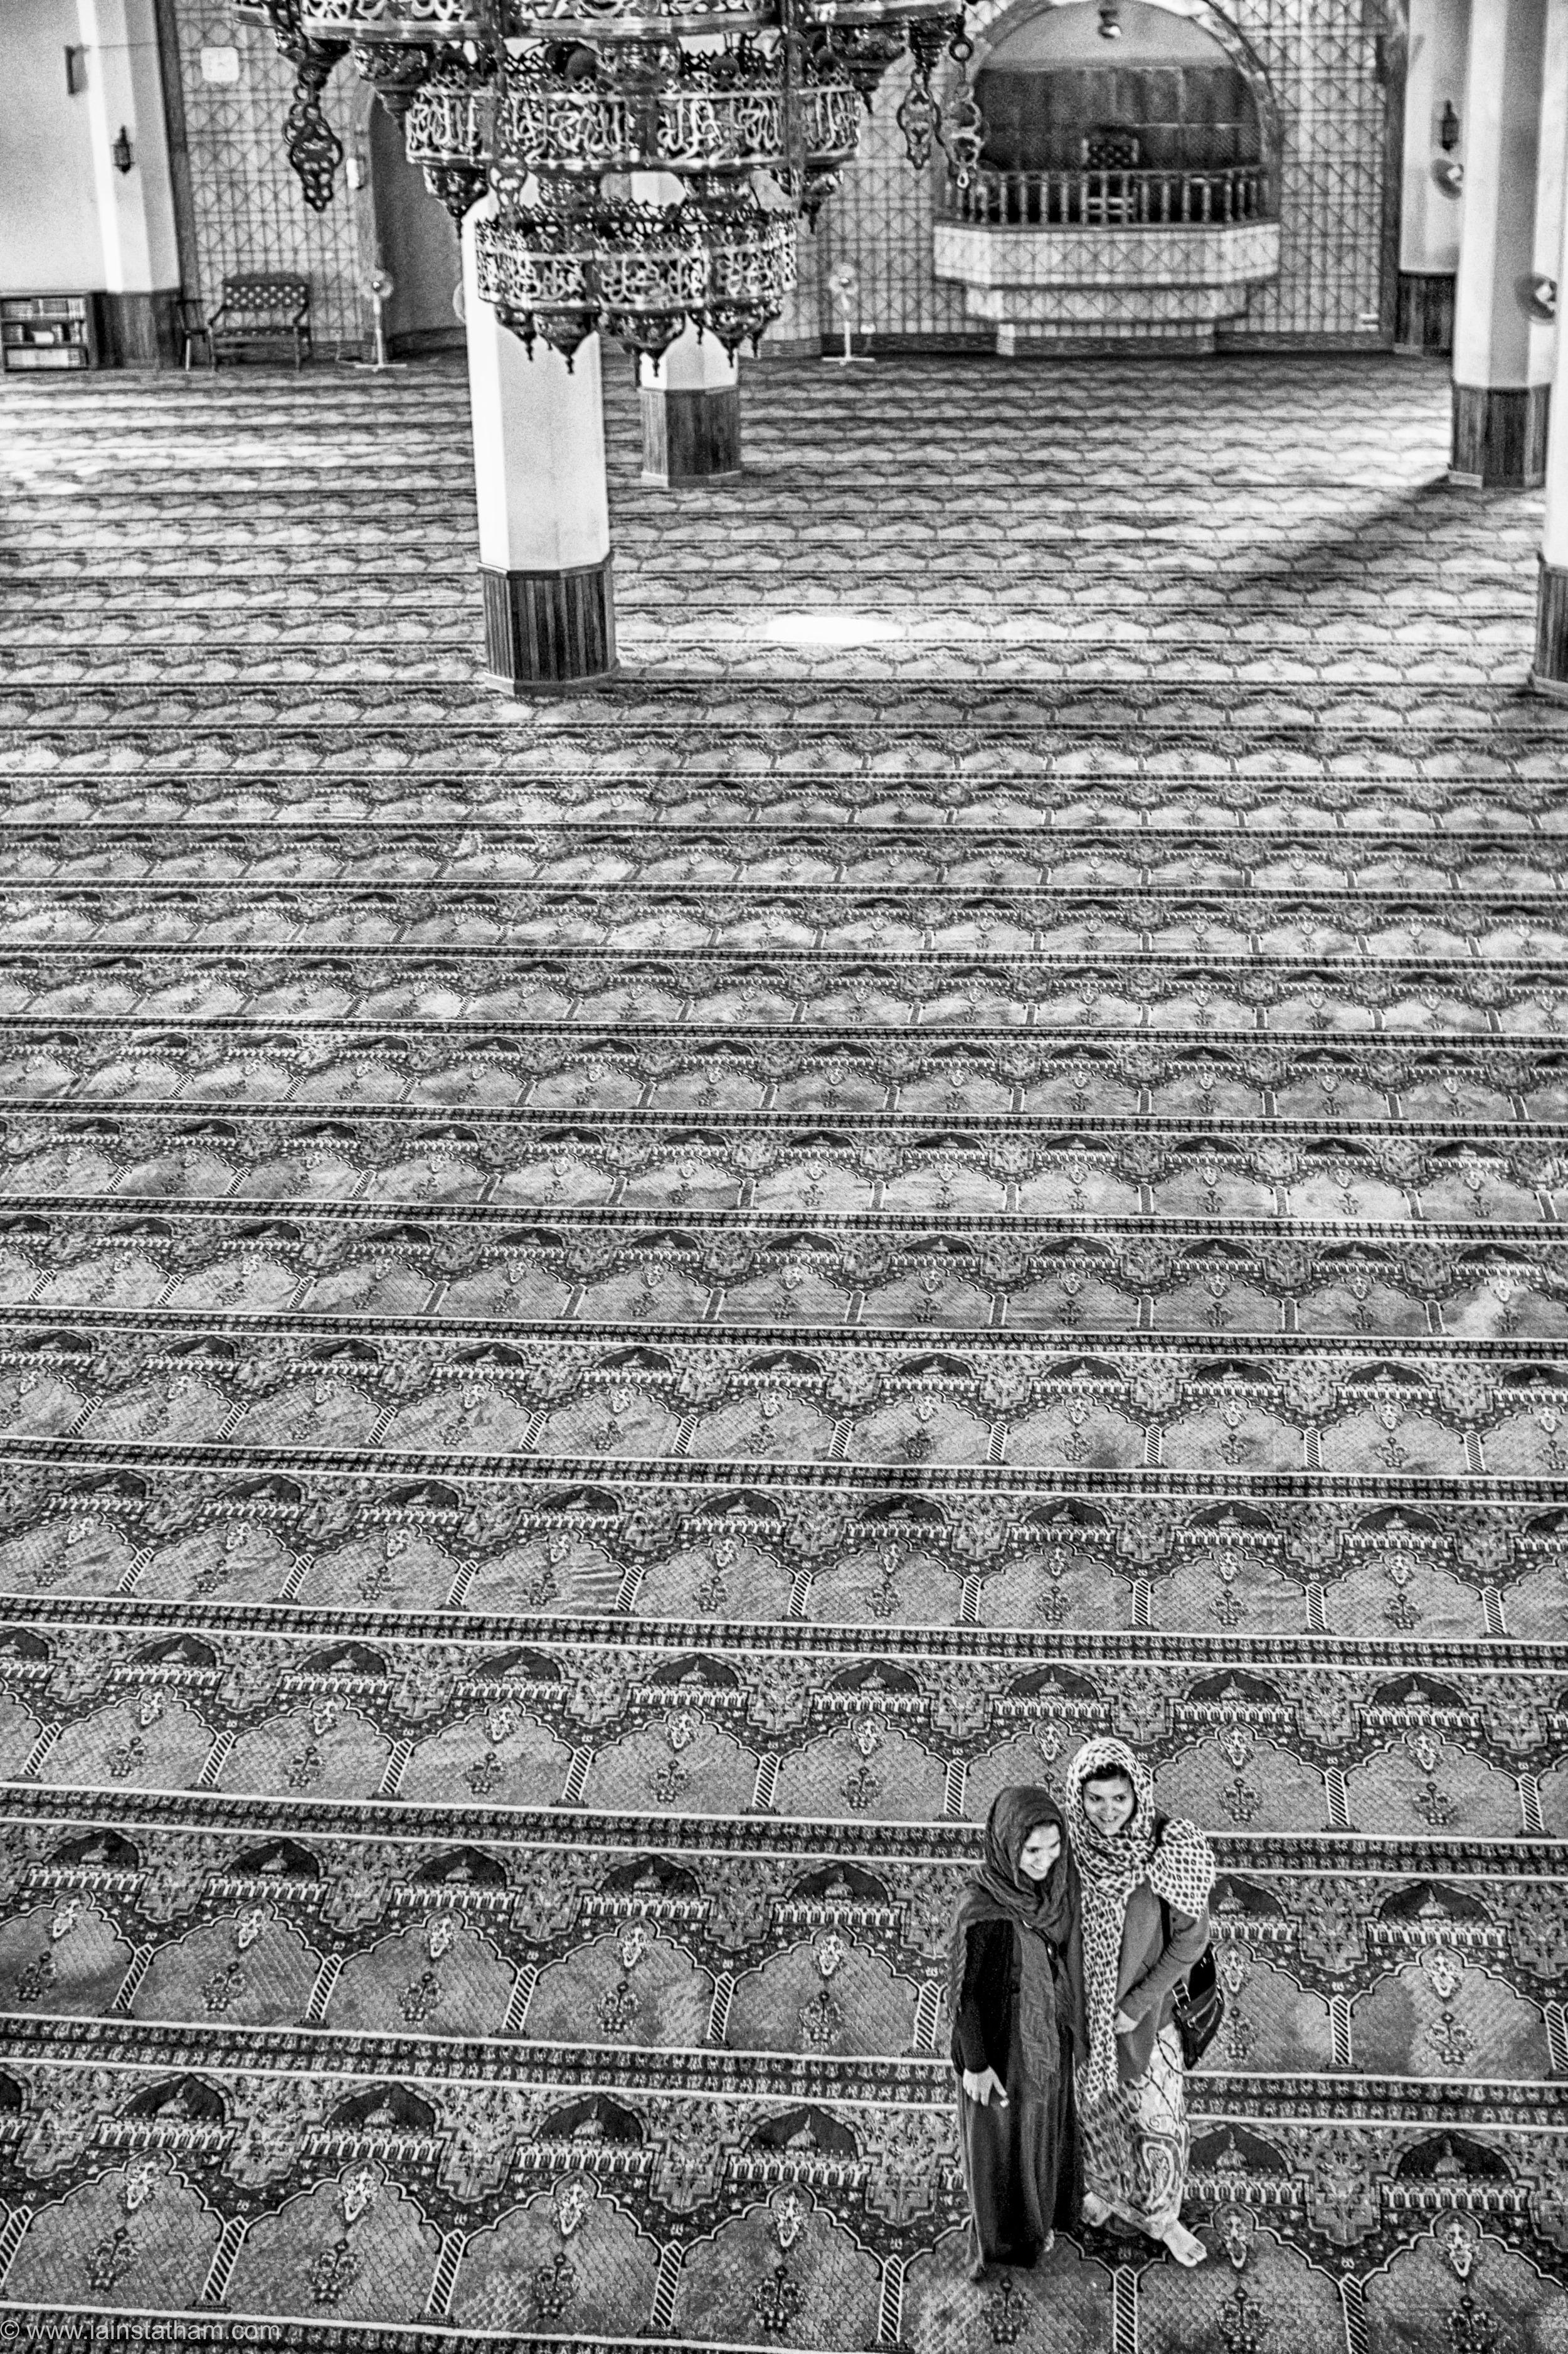 ug - kampala - gadaffi mosque - bw-5.jpg